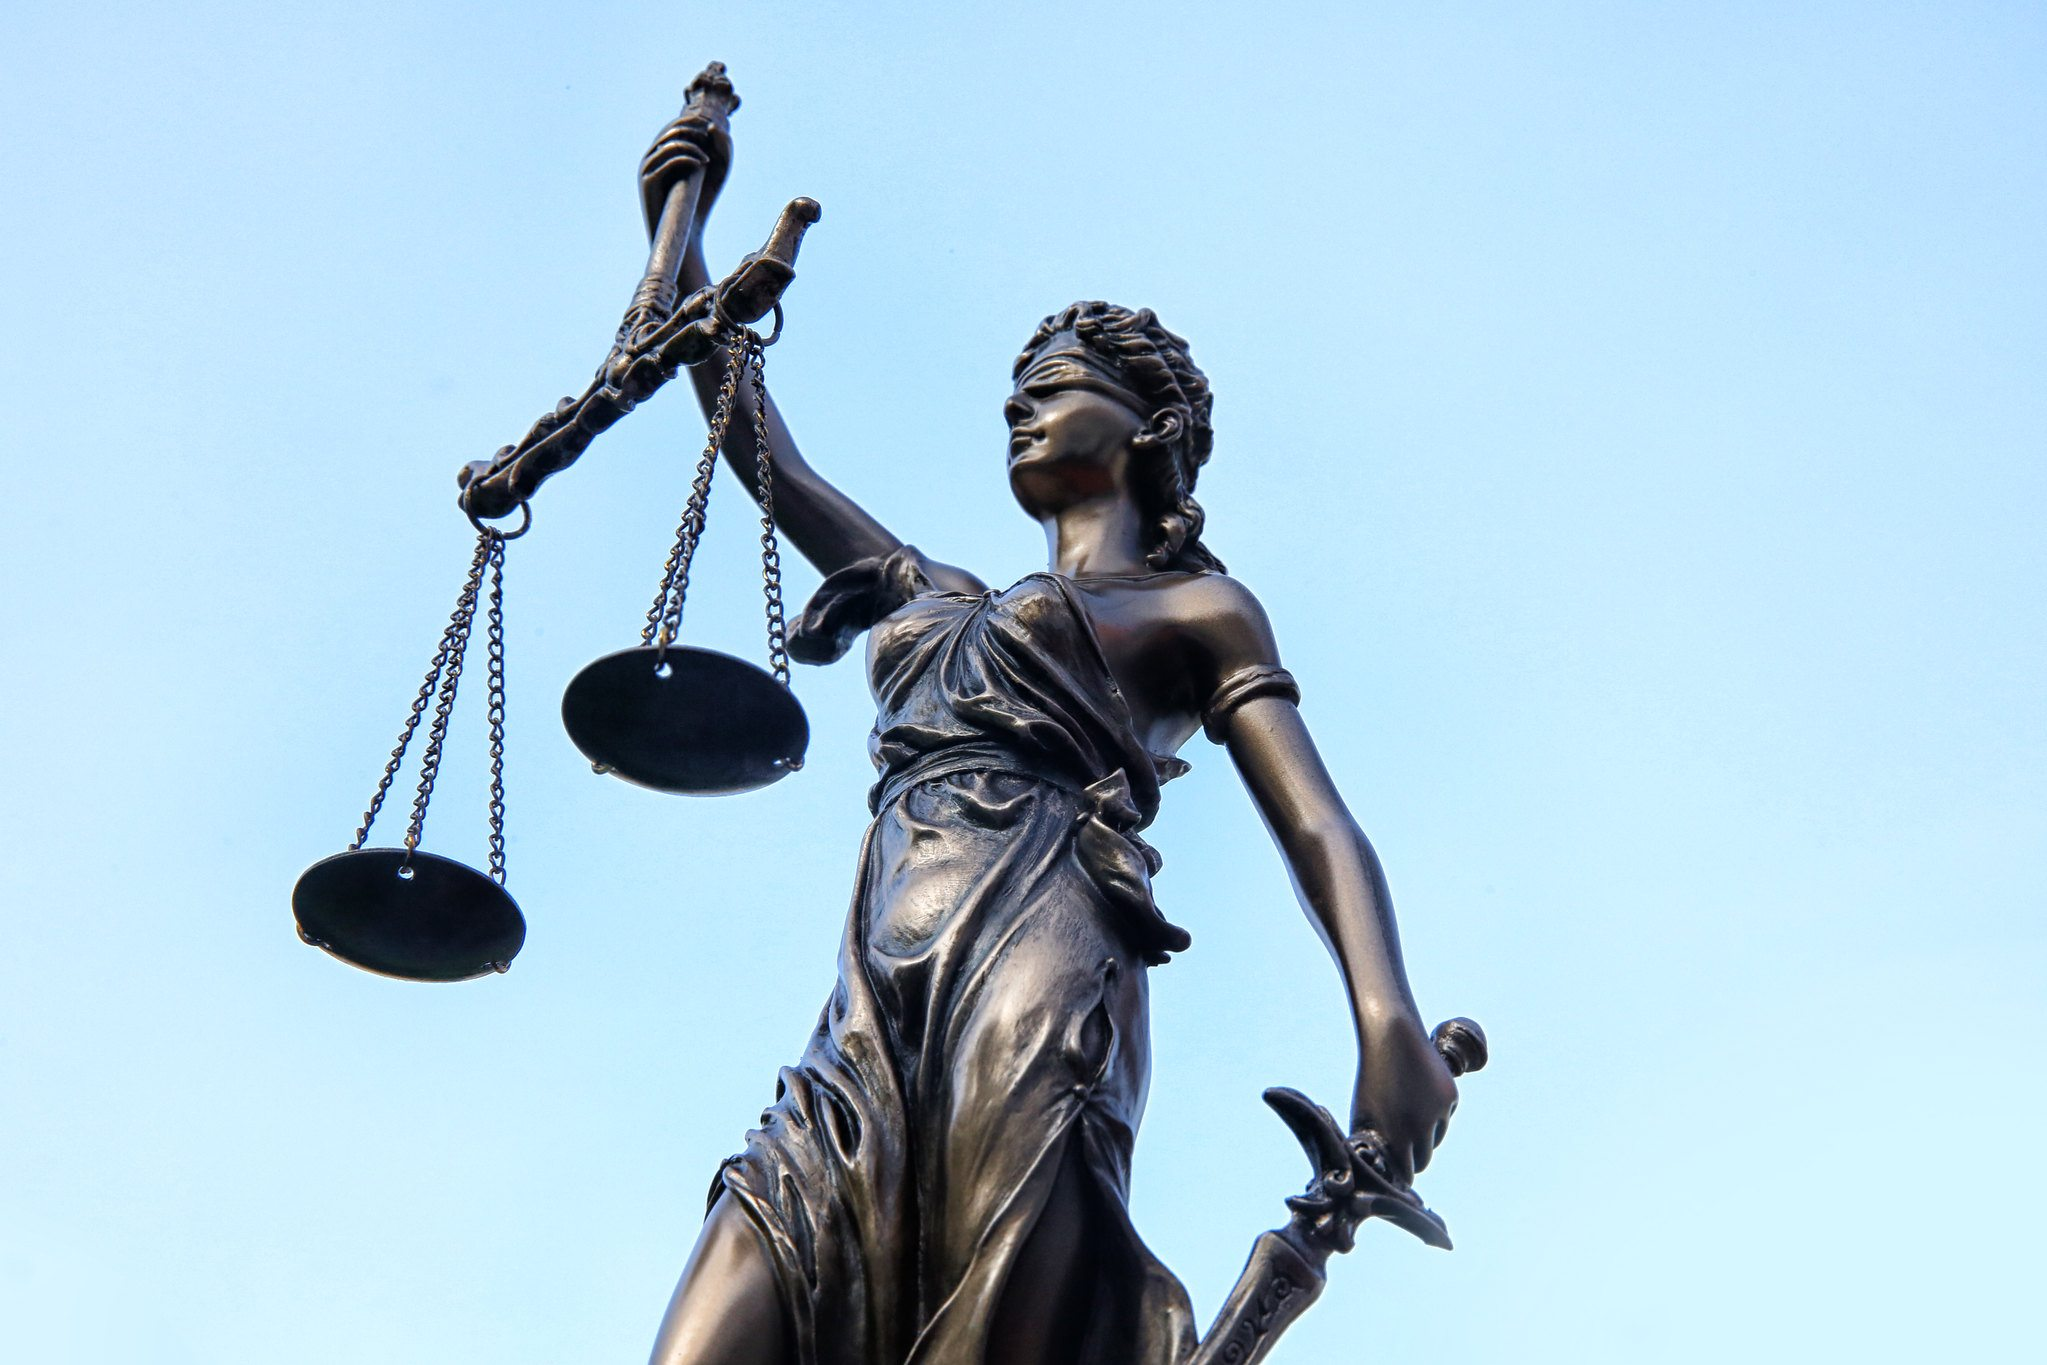 Justitia Statue vor blauem Himmel